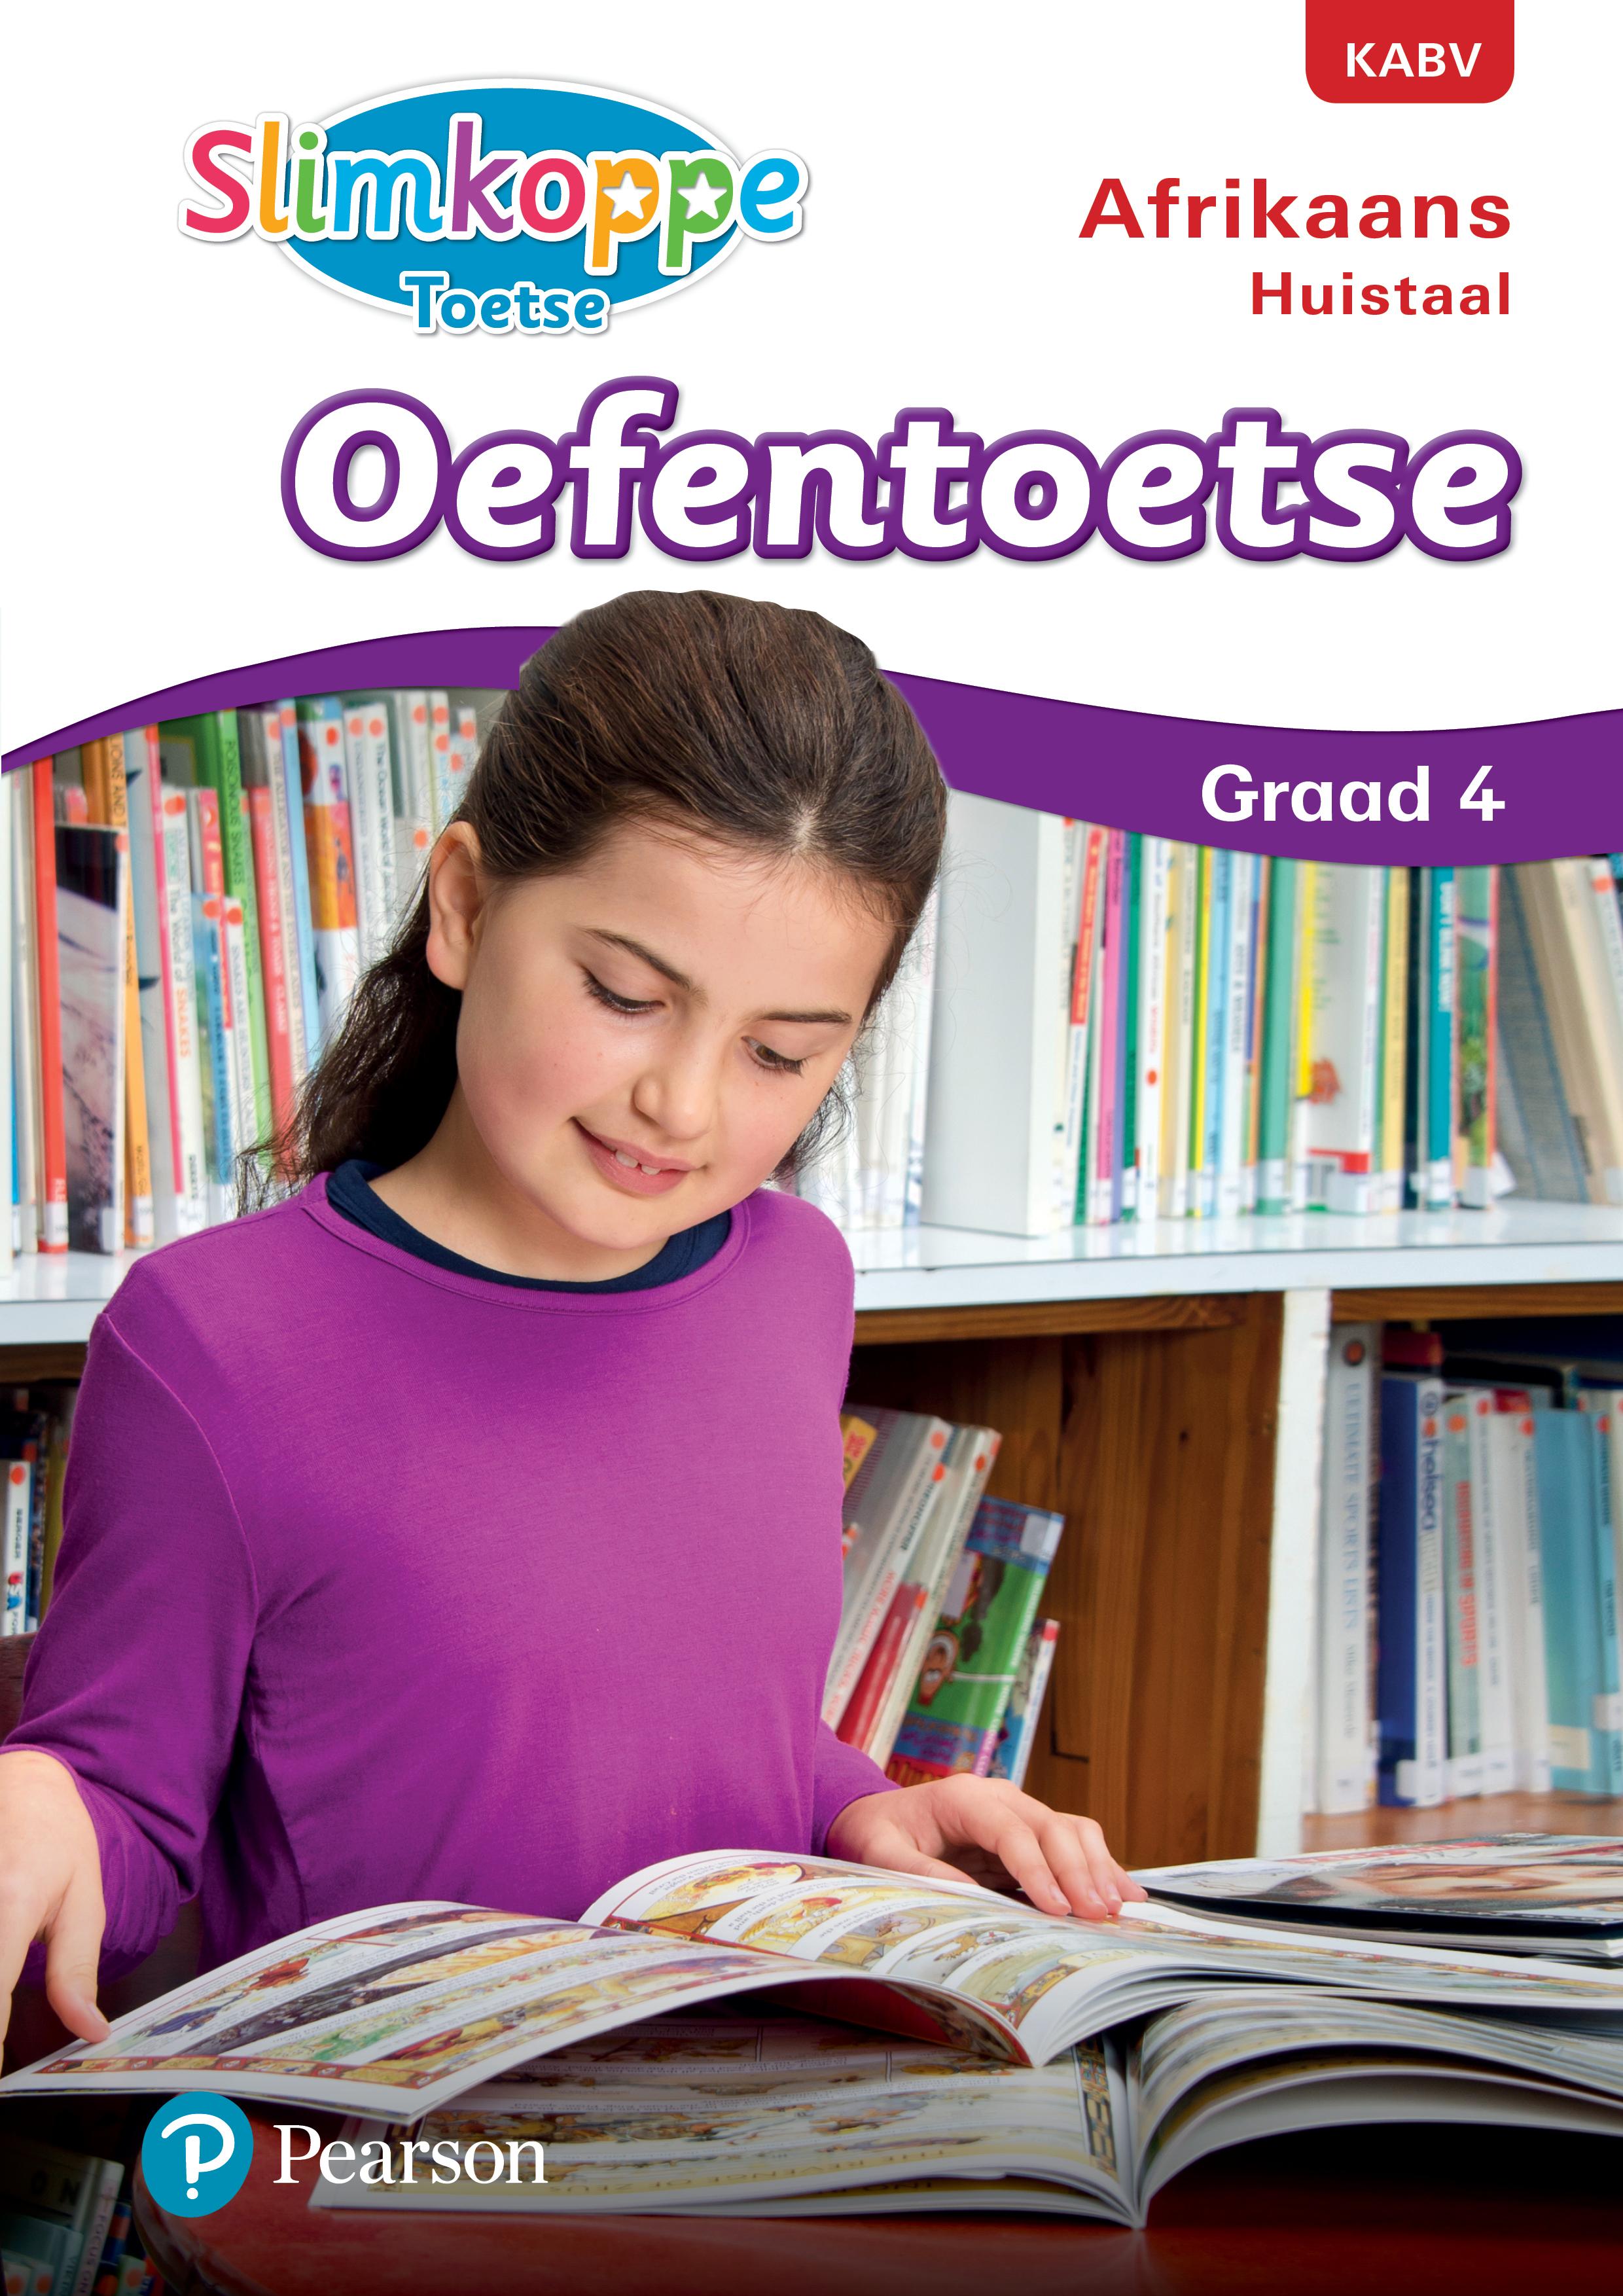 Picture of Slimkoppe Toetse: Afrikaans Huistaal: Grade 4: Oefentoetse